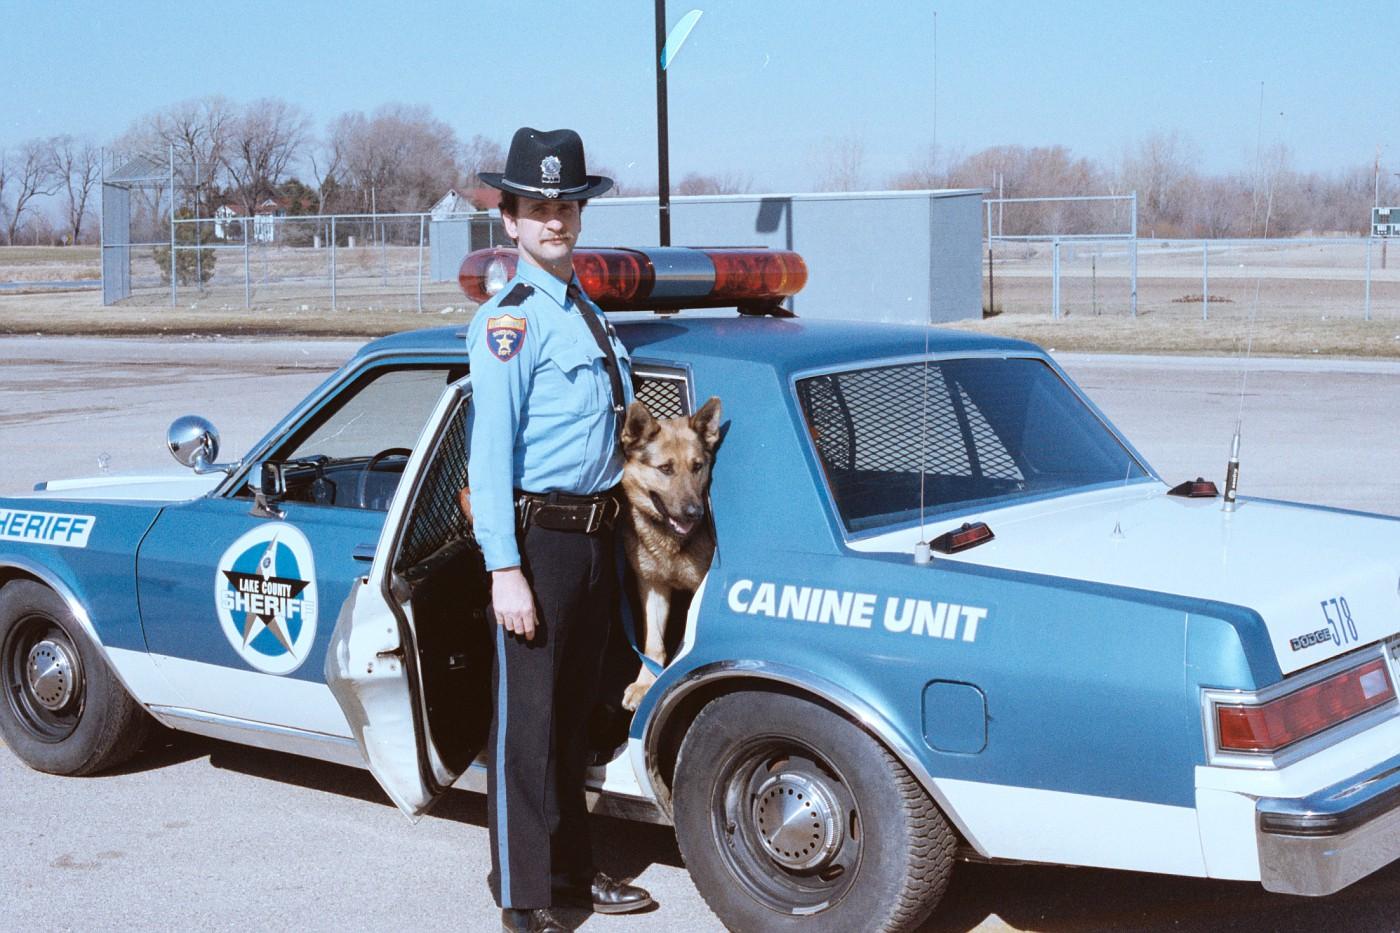 Photo: IL - Lake County Sheriff 1983 Dodge Diplomat K-9